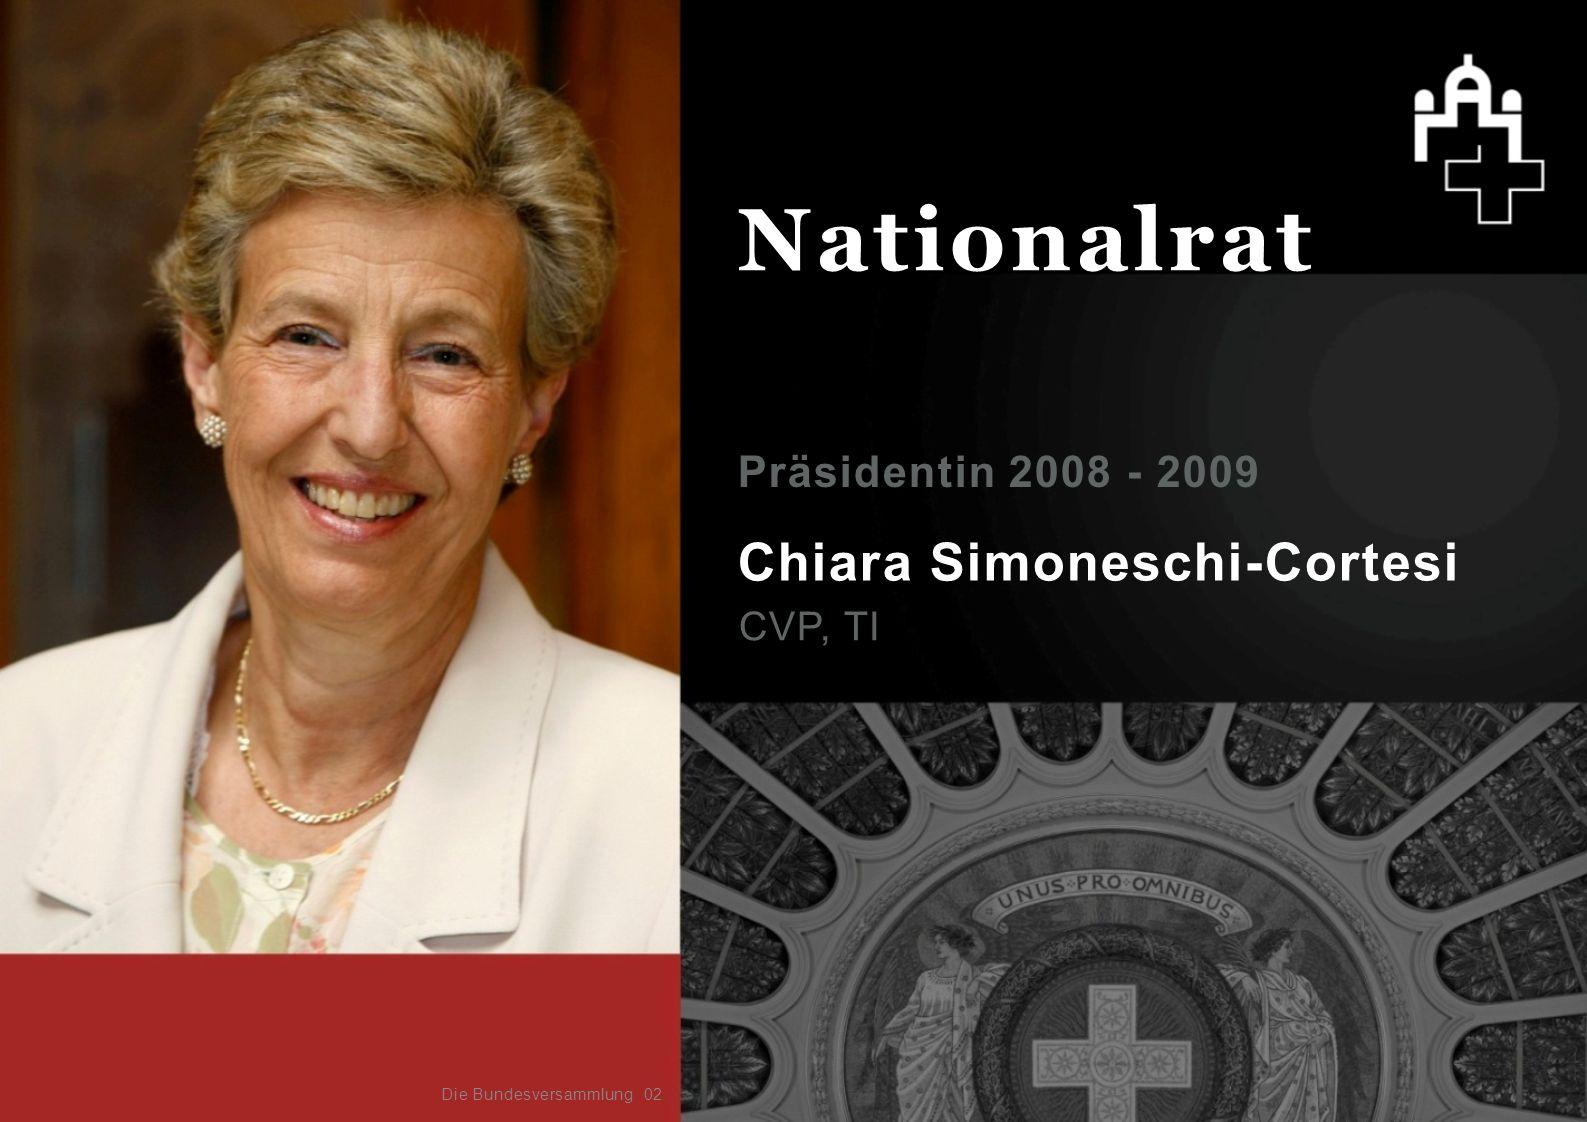 Chiara Simoneschi-Cortesi CVP, TI Präsidentin 2008 - 2009 02 Nationalrat Die Bundesversammlung